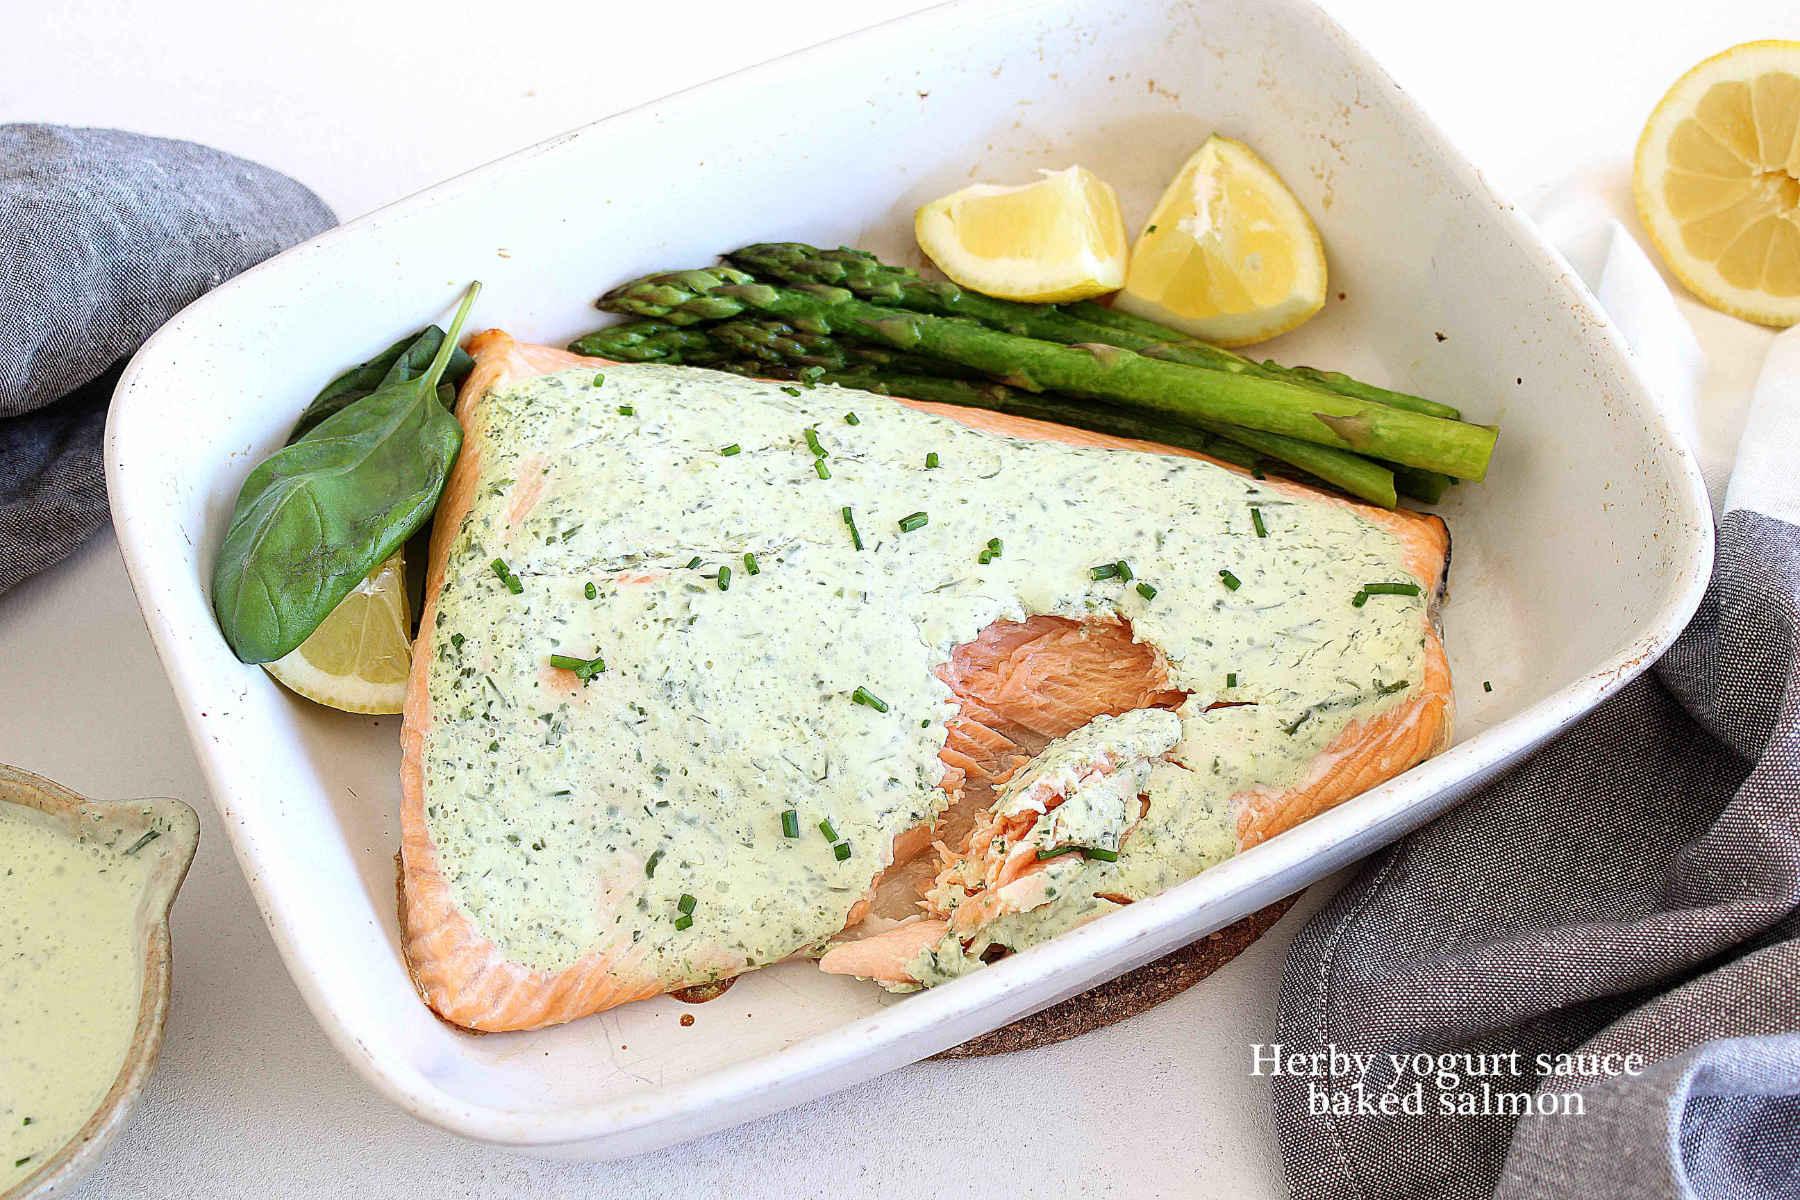 Herby yogurt sauce baked salmon